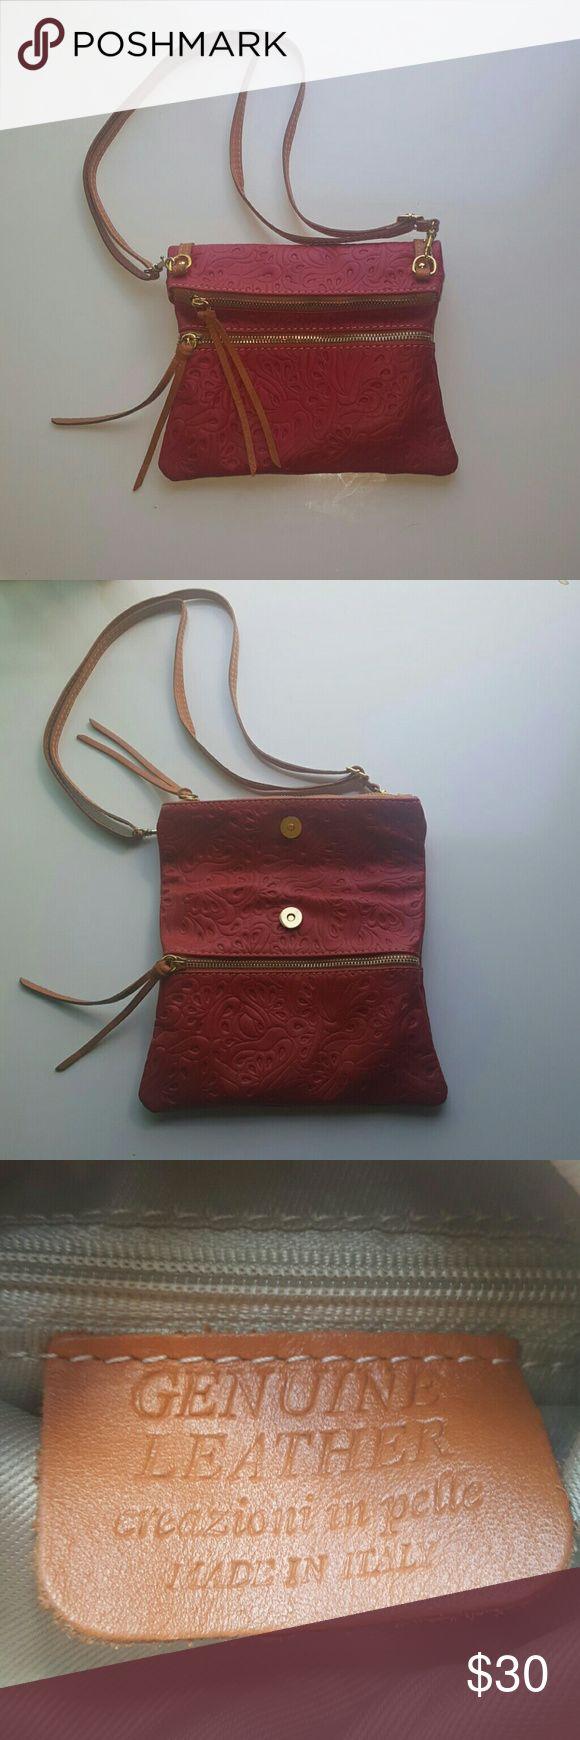 Italian Leather Handbag You can smell the leather!  Beautifully designed Italian handbag Bags